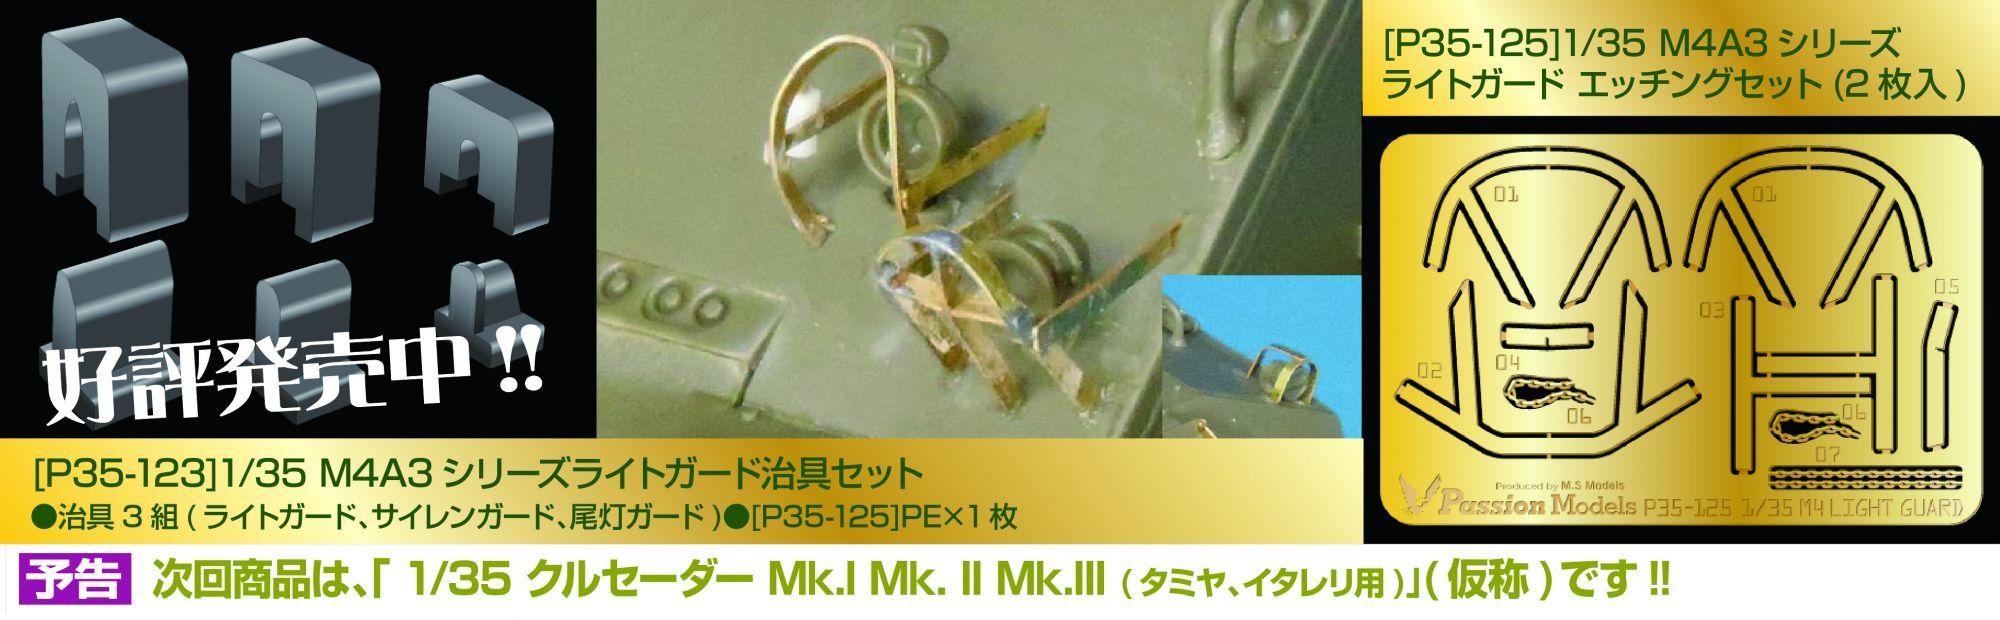 [P35-123]1/35 M4A3シリーズ ライトガード治具セット(タミヤM4A3シリーズ MM35250/35251/35346用)